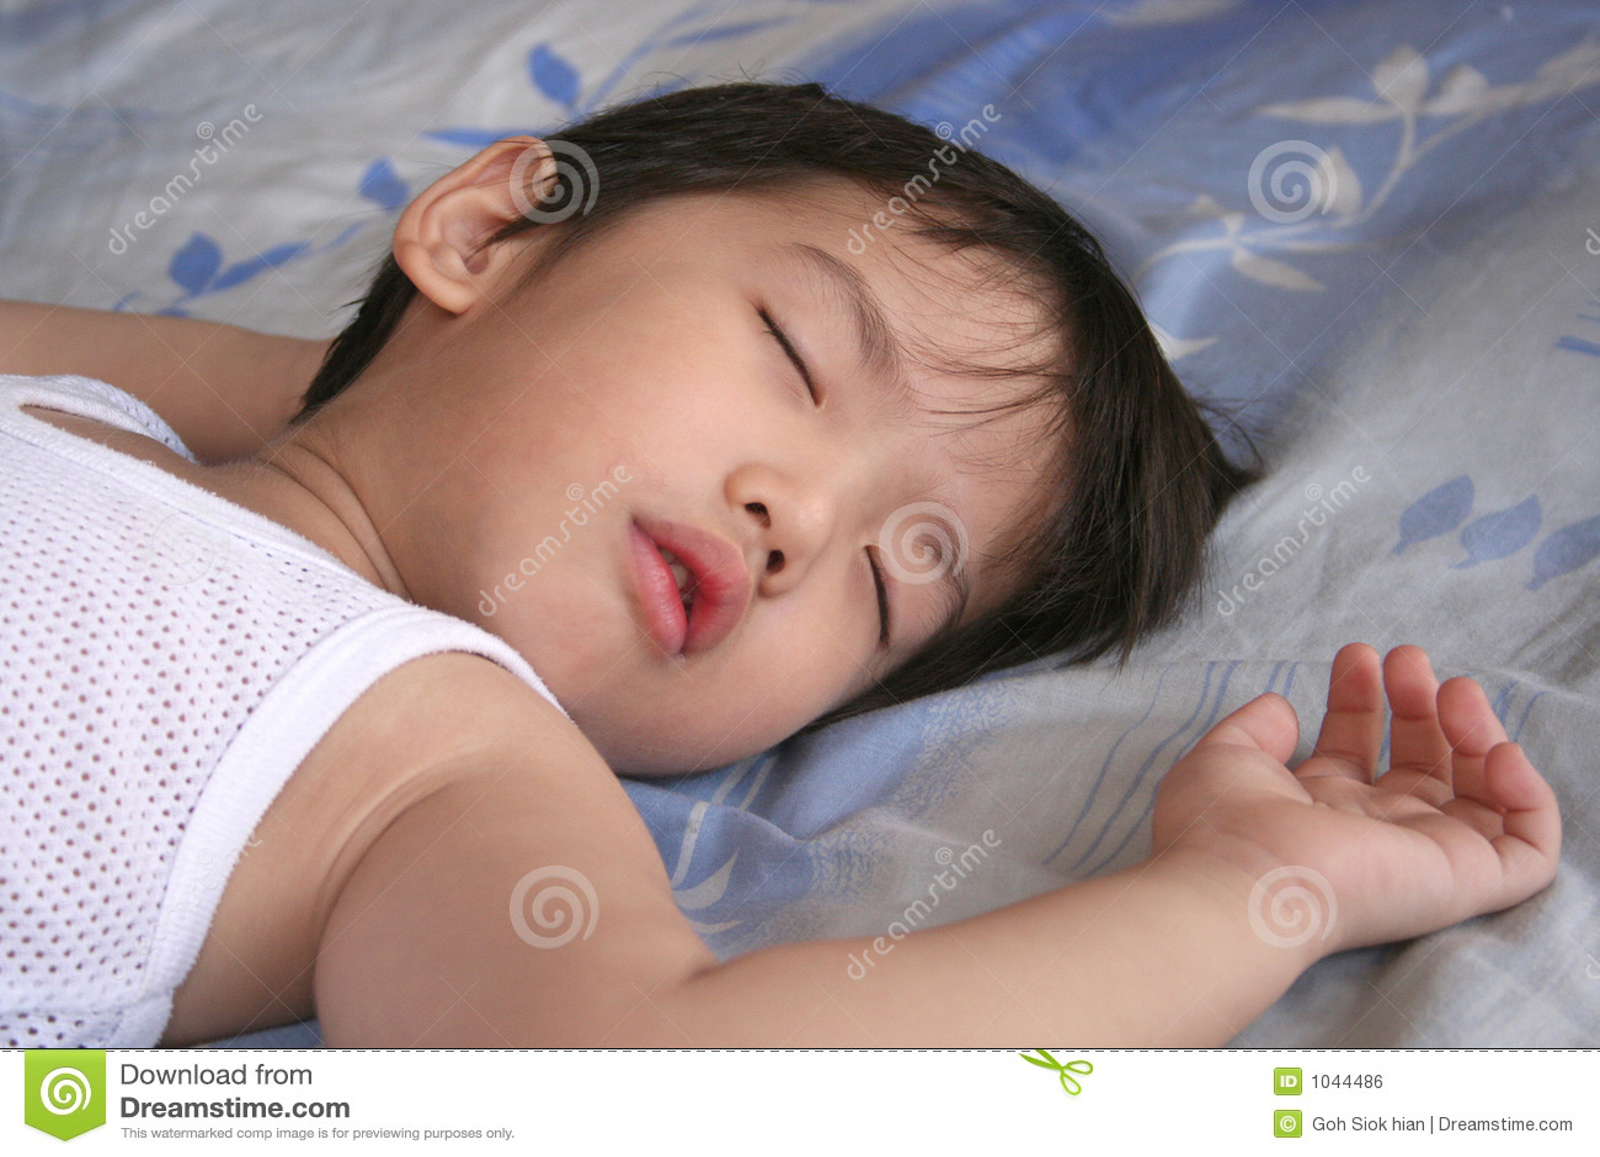 SexiShannon Sleeps With A Raw